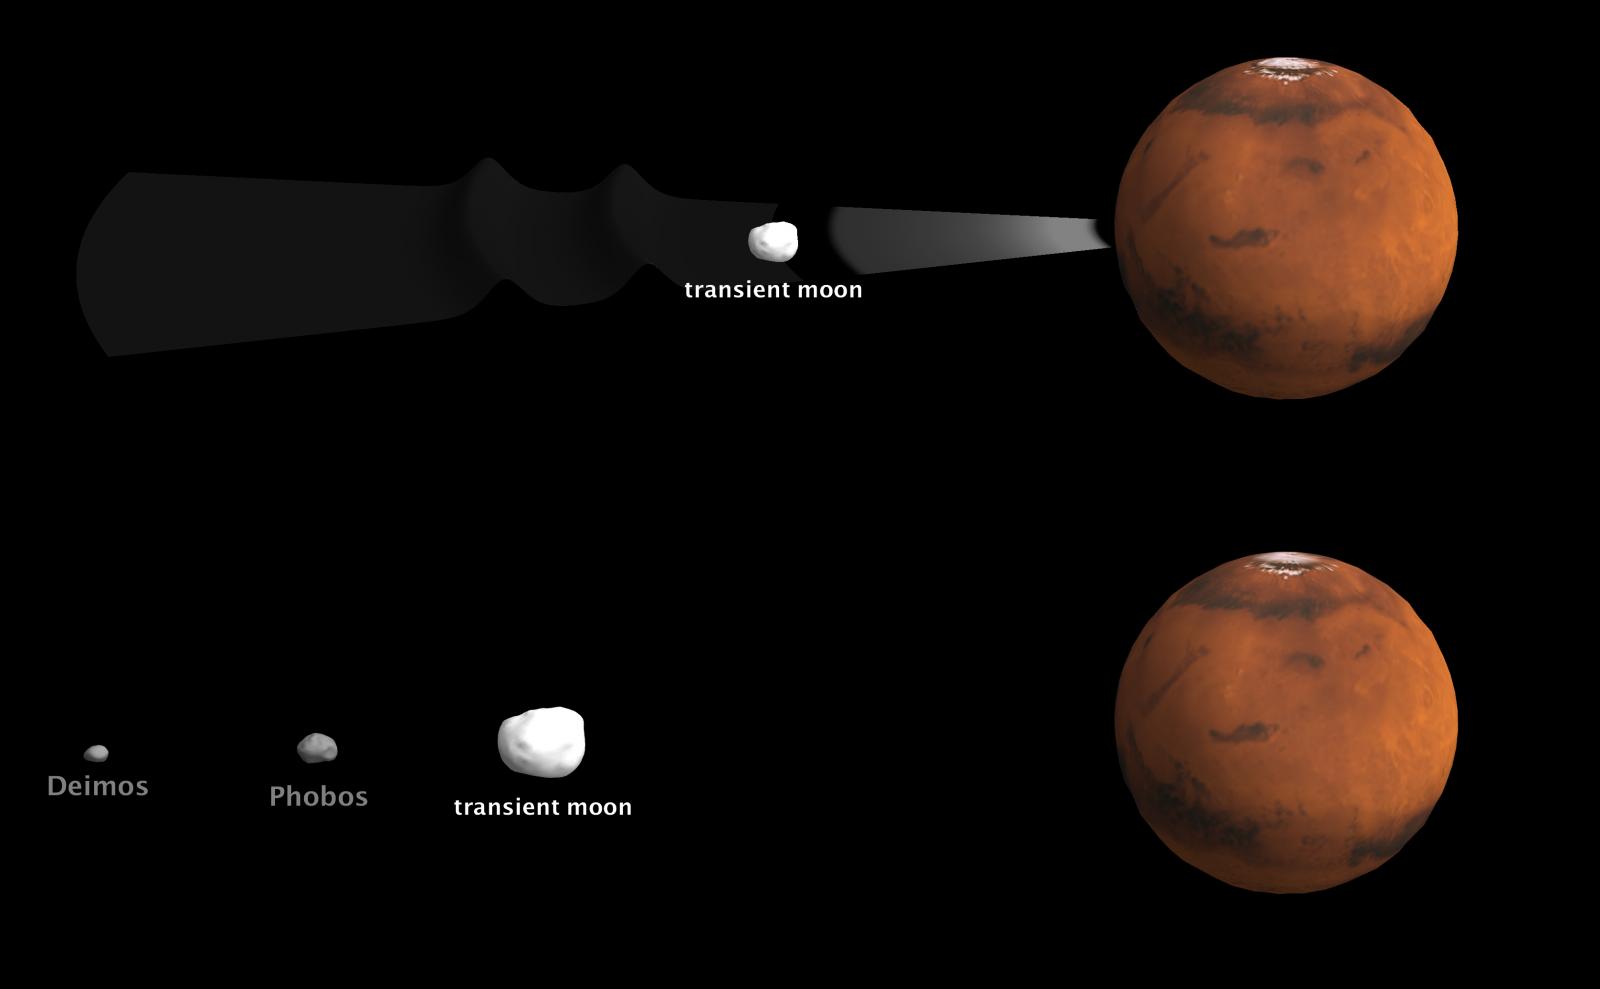 mars moons giant impact